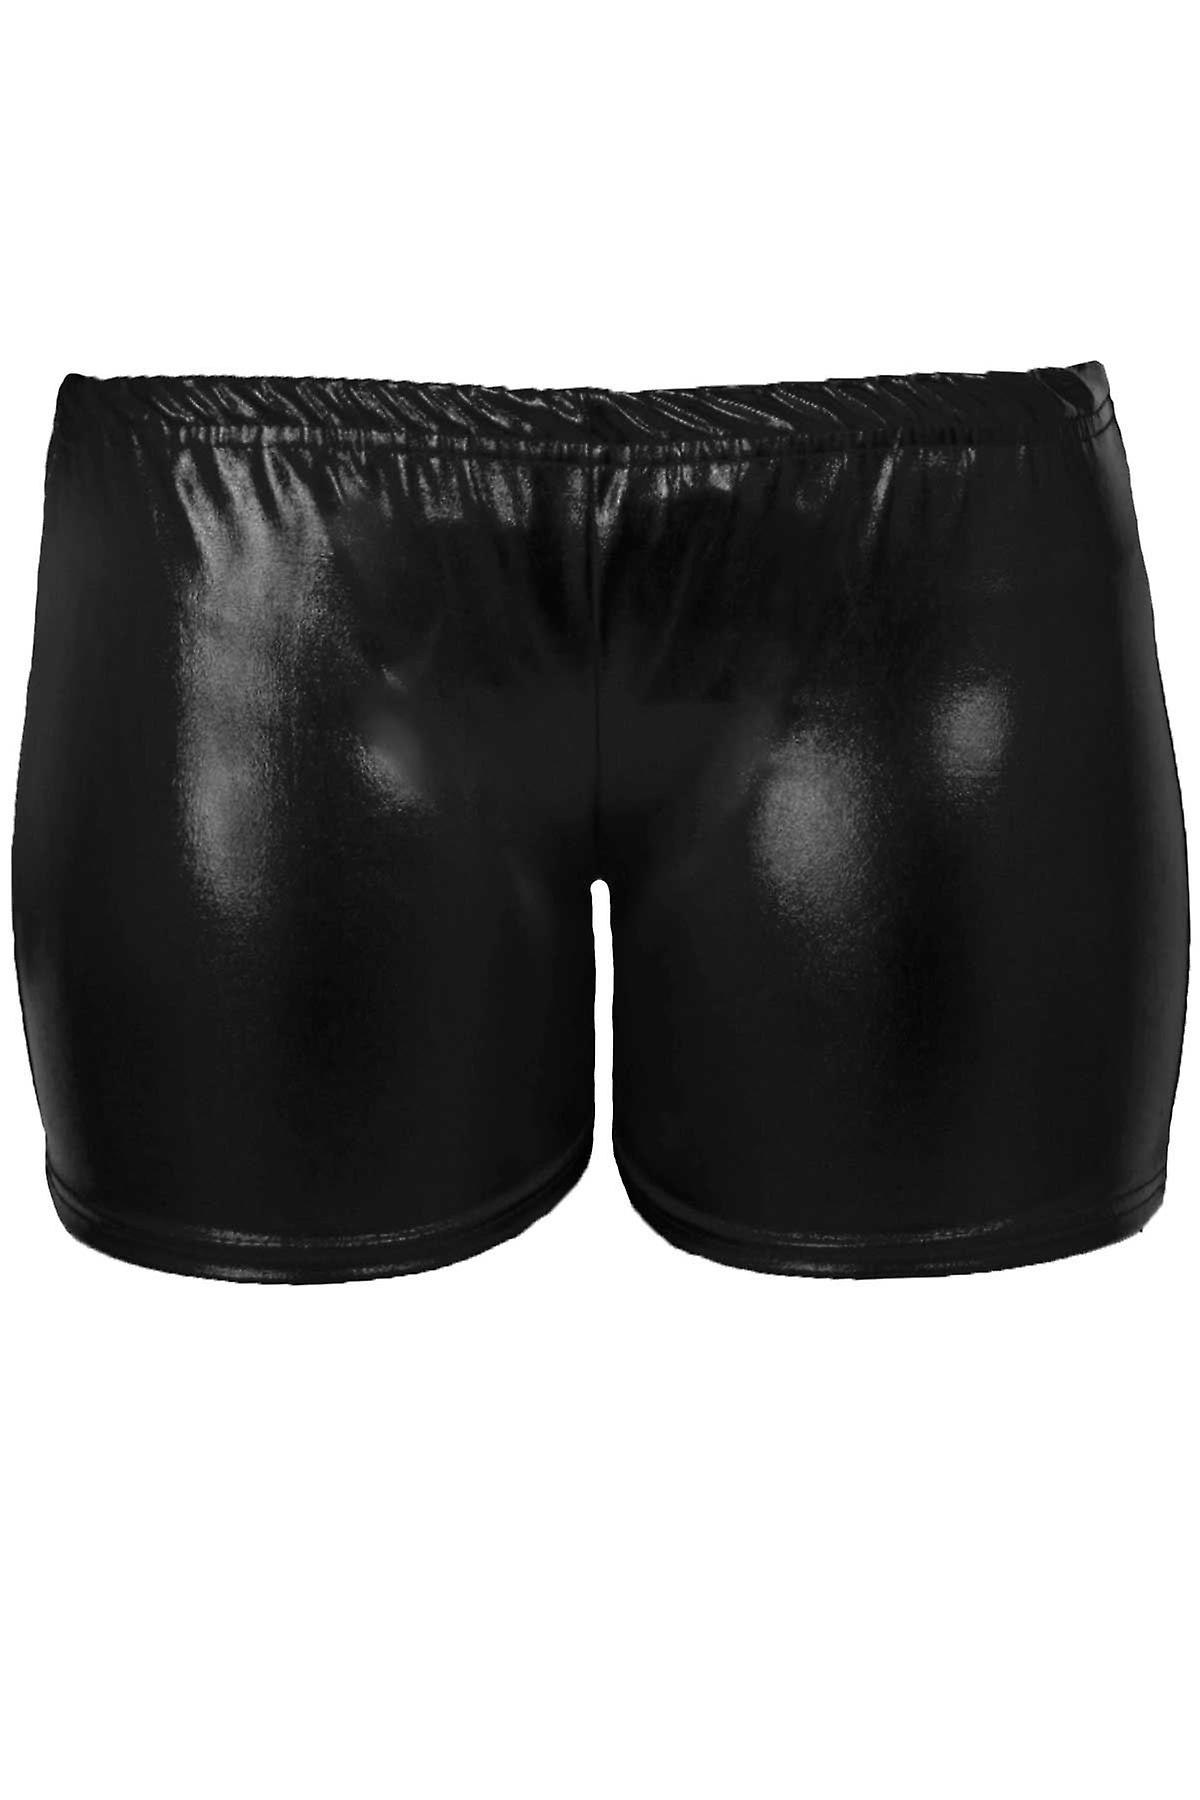 Girls Metallic Wet Look Gymnastics Dance Stretch Party Children's Hot Pants Shorts